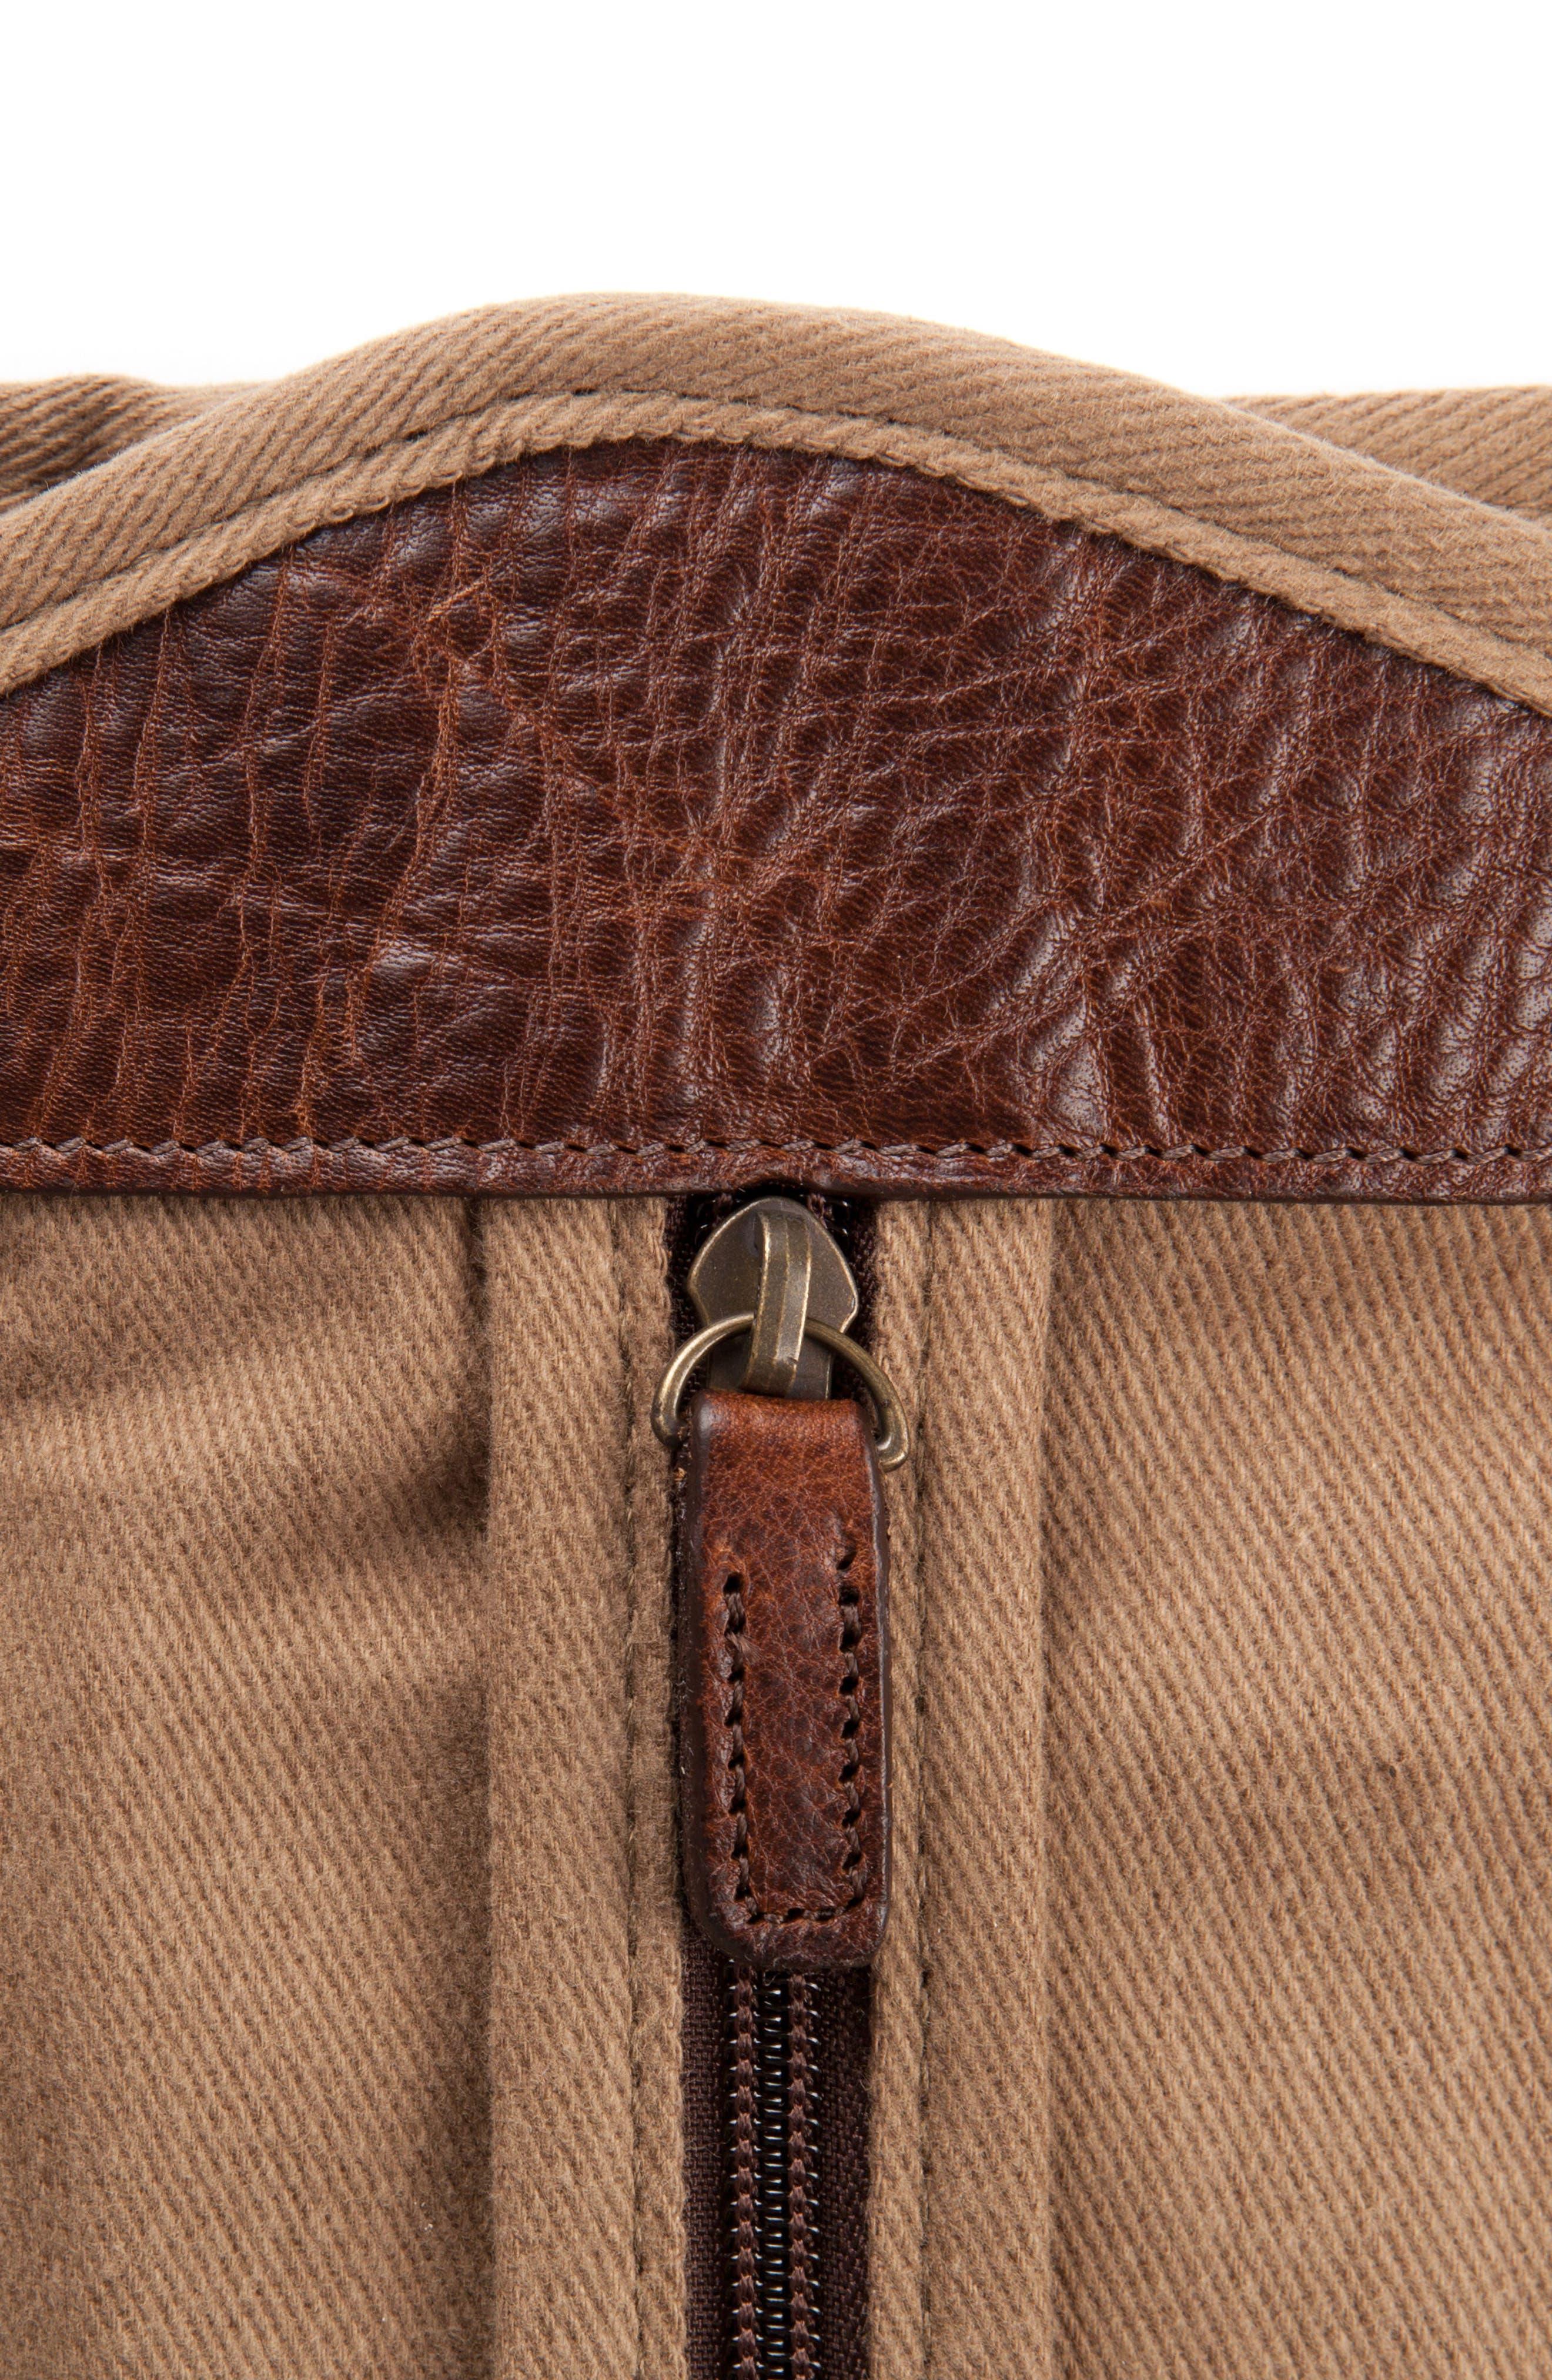 Holton Garment Bag,                             Alternate thumbnail 2, color,                             Brushed Tan Twill